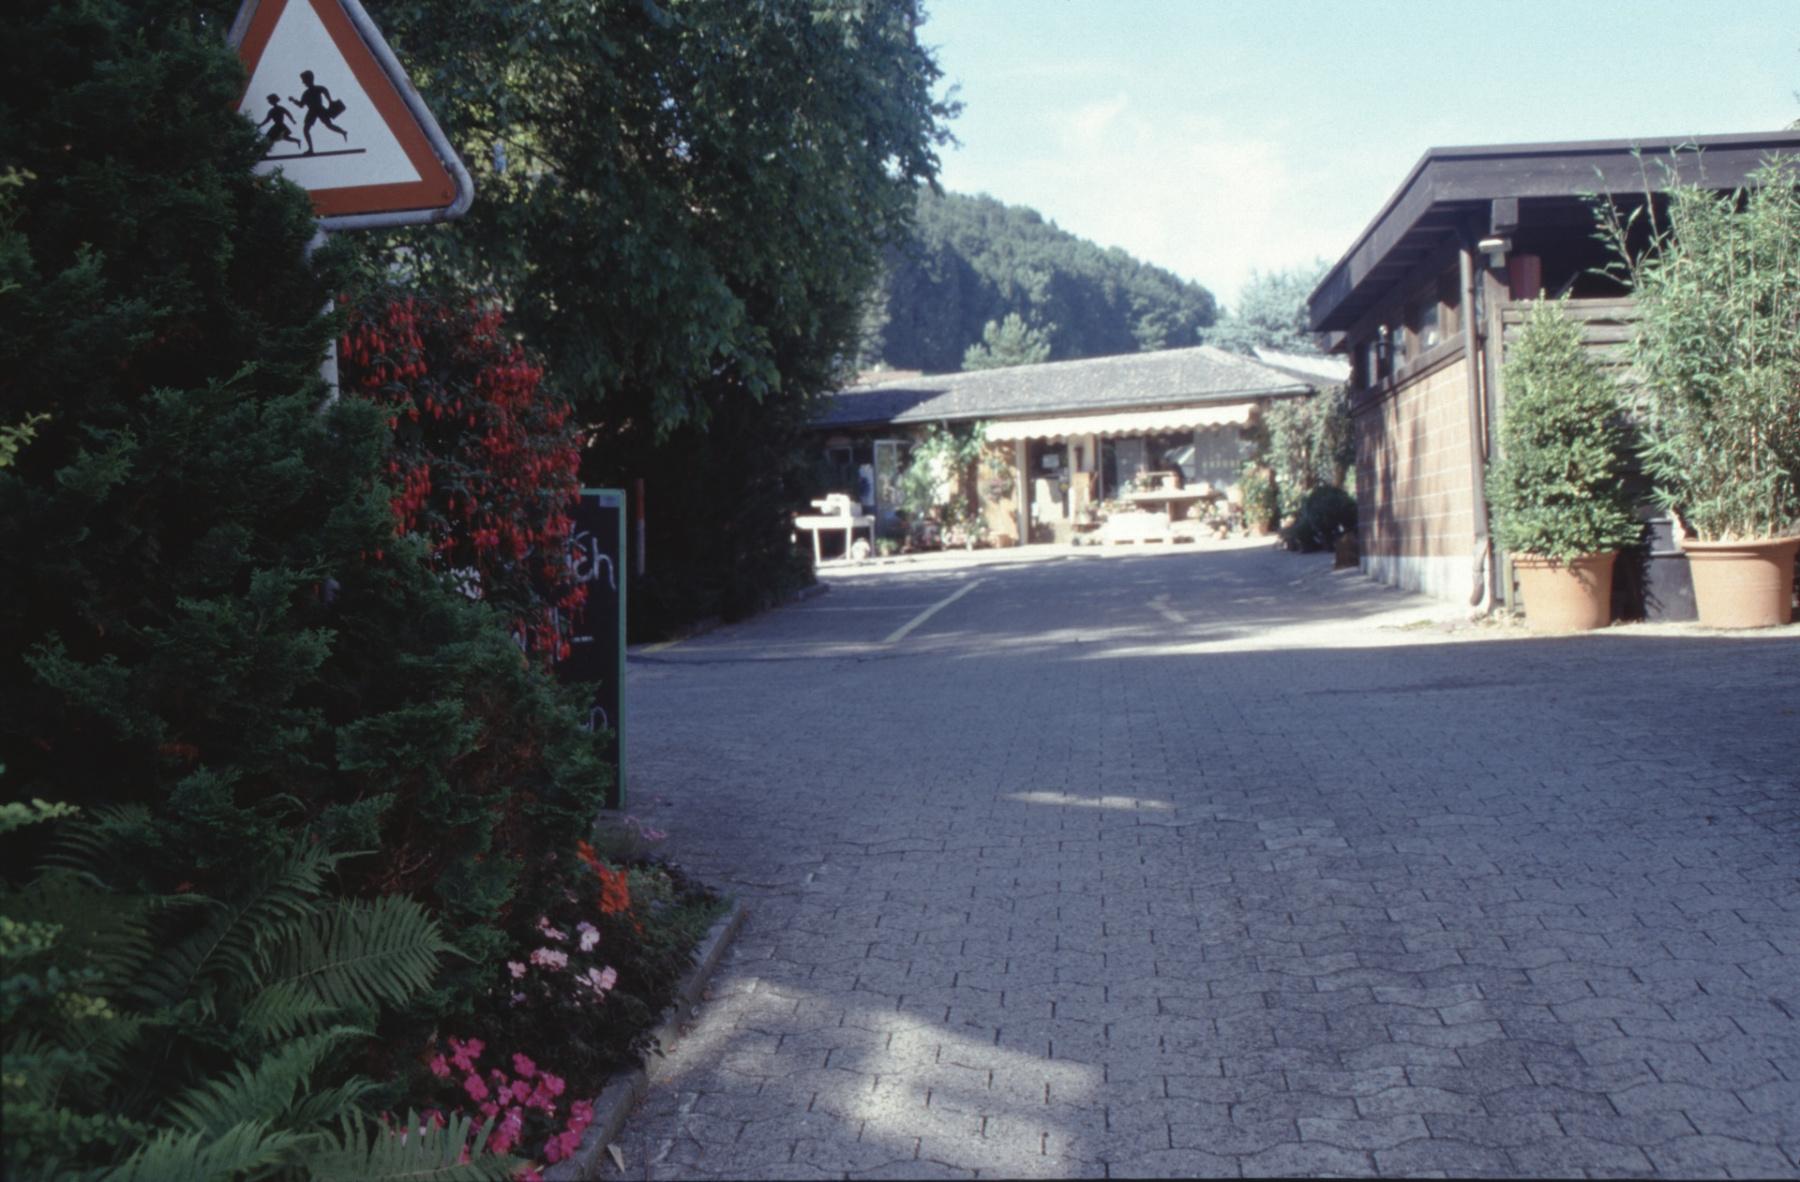 Einfahrt zur Gärtnerei Struzenegger